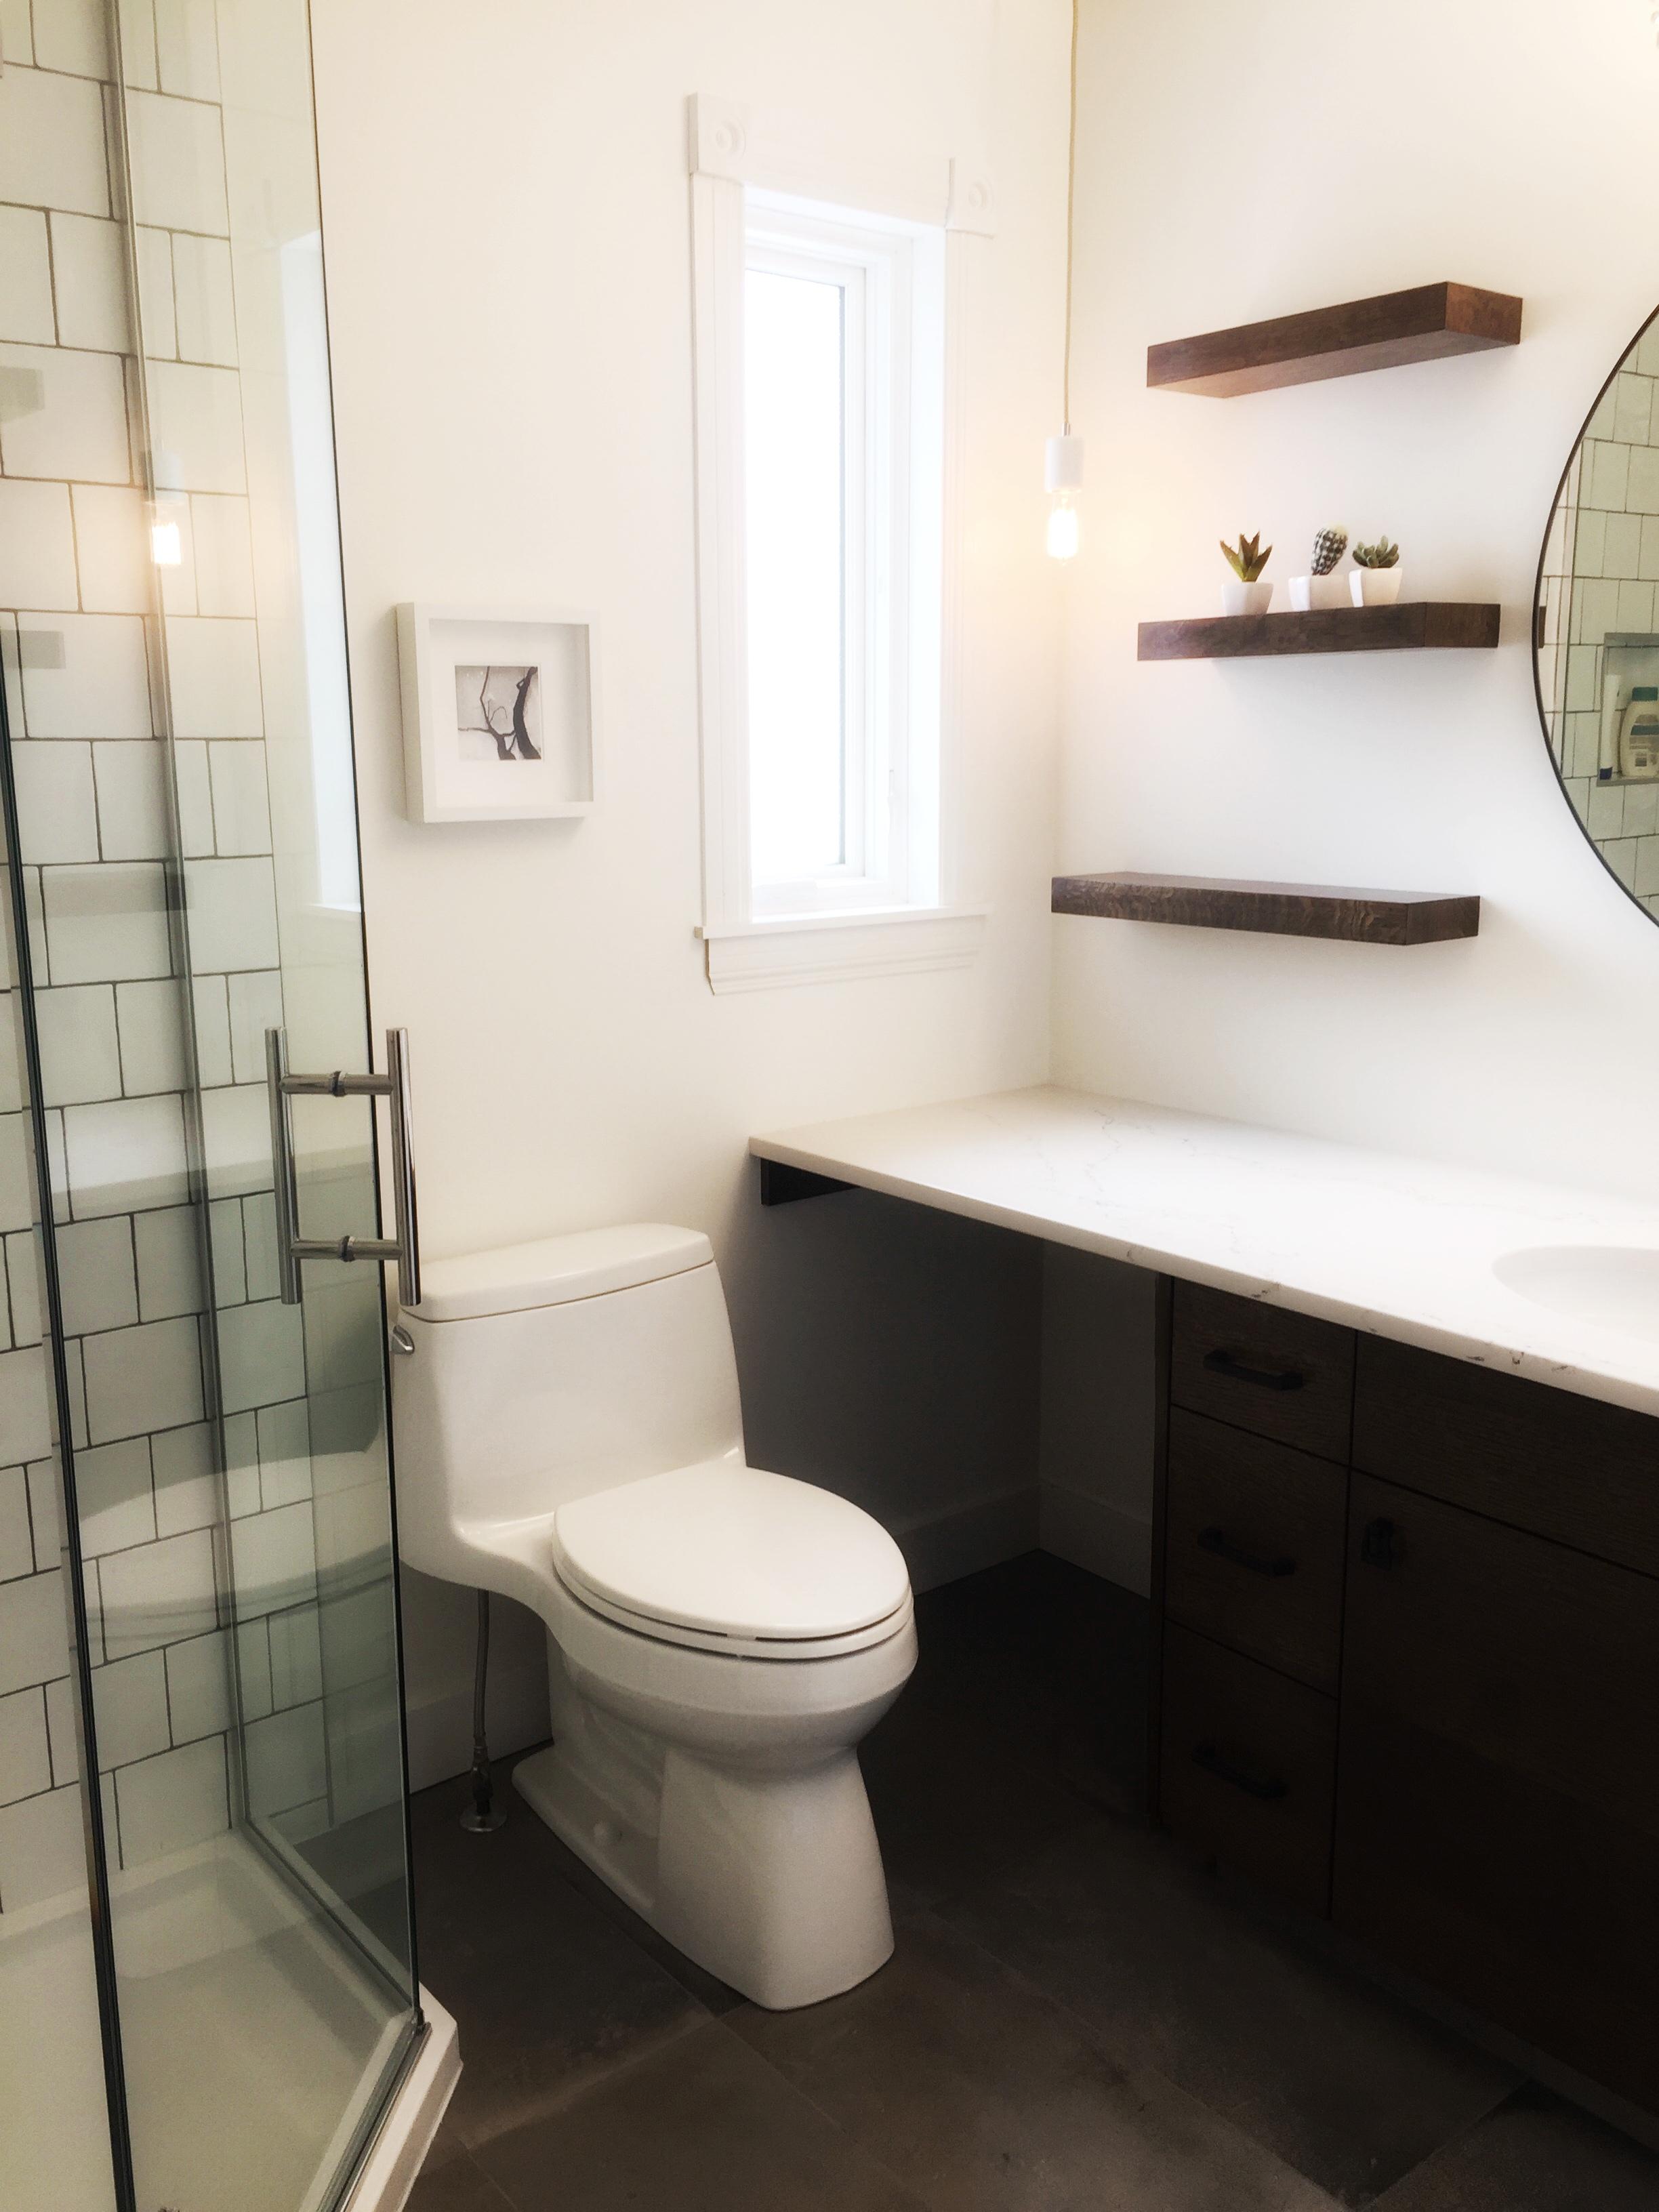 Riverbend Bathroom Renovation